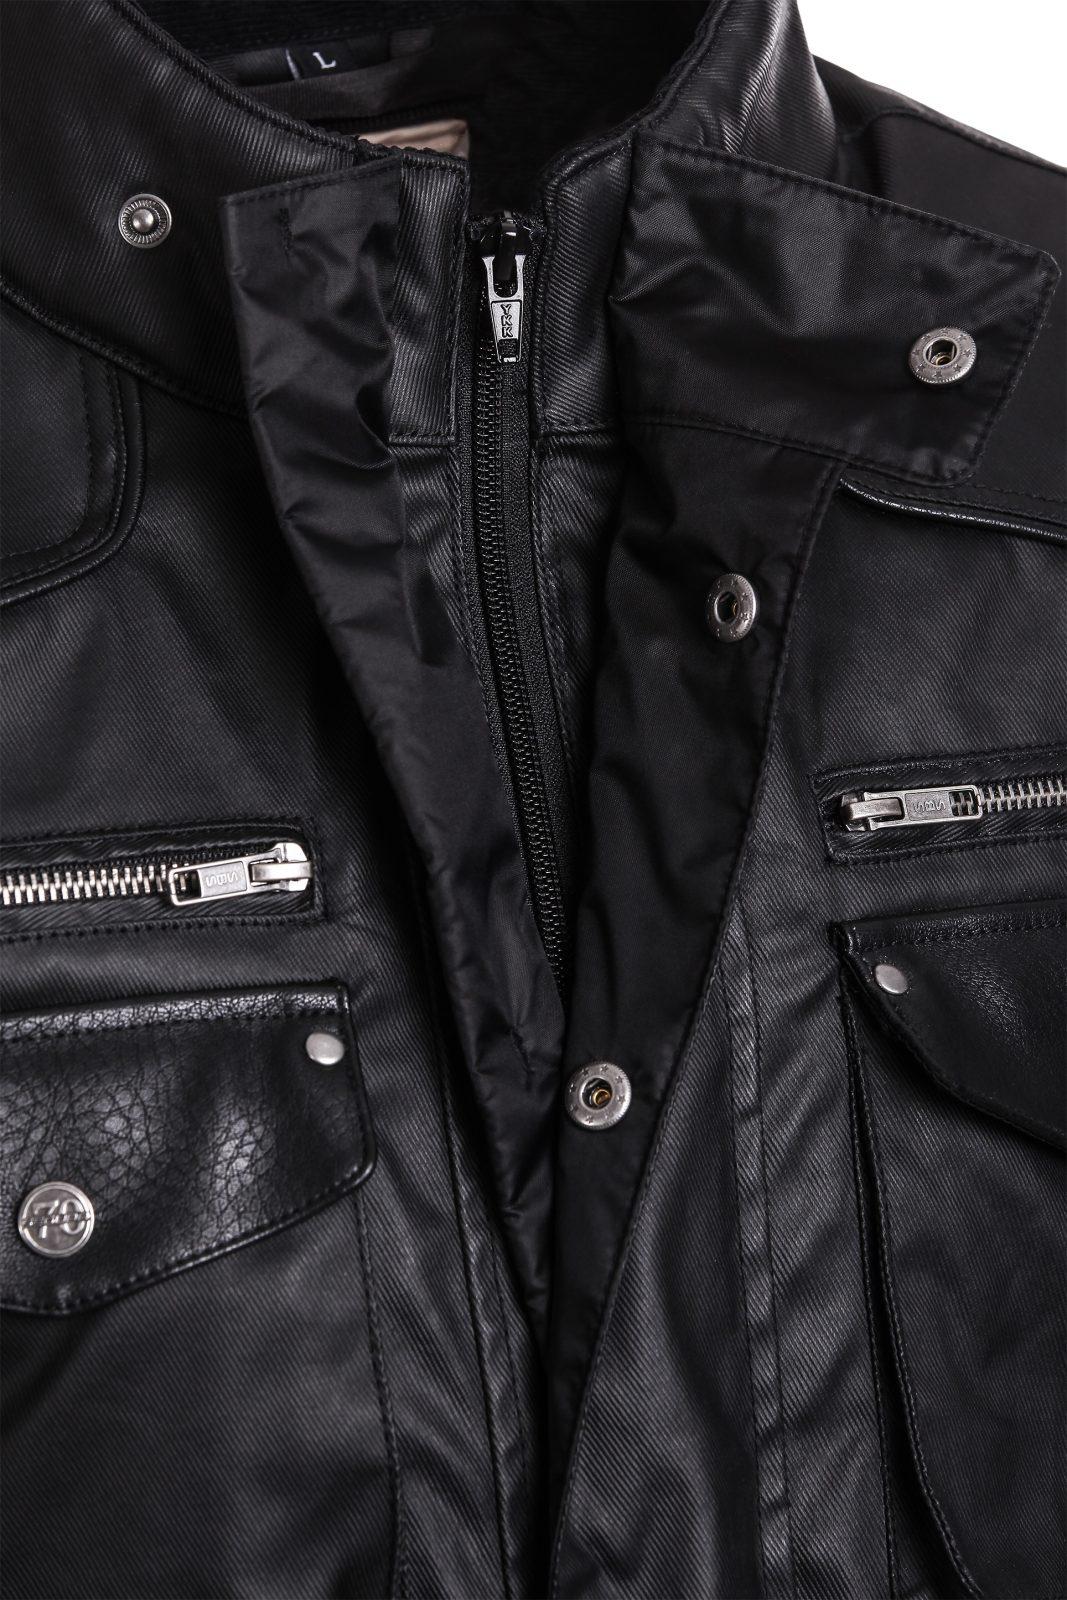 7e97e1d2f It's time to go Nomad- Segura motorcycle jacket - Australian ...